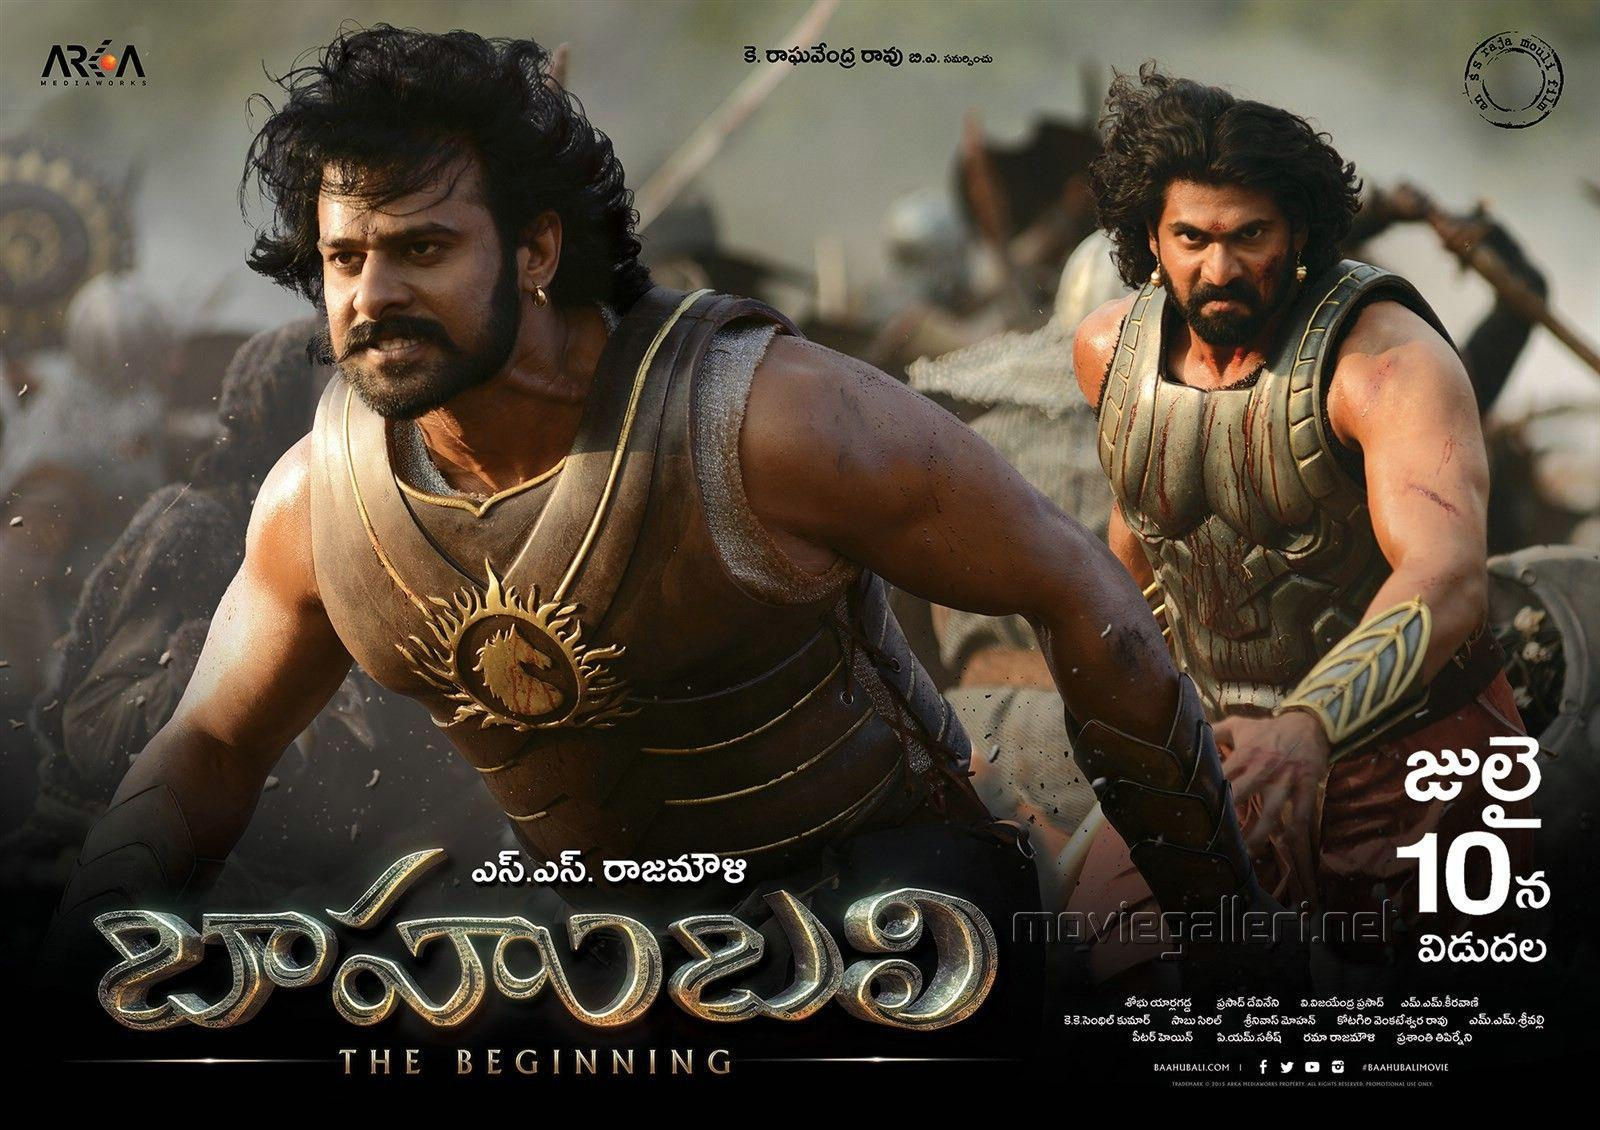 Actor Prabhas Baahubali New Look Wallpapers | New Movie Posters